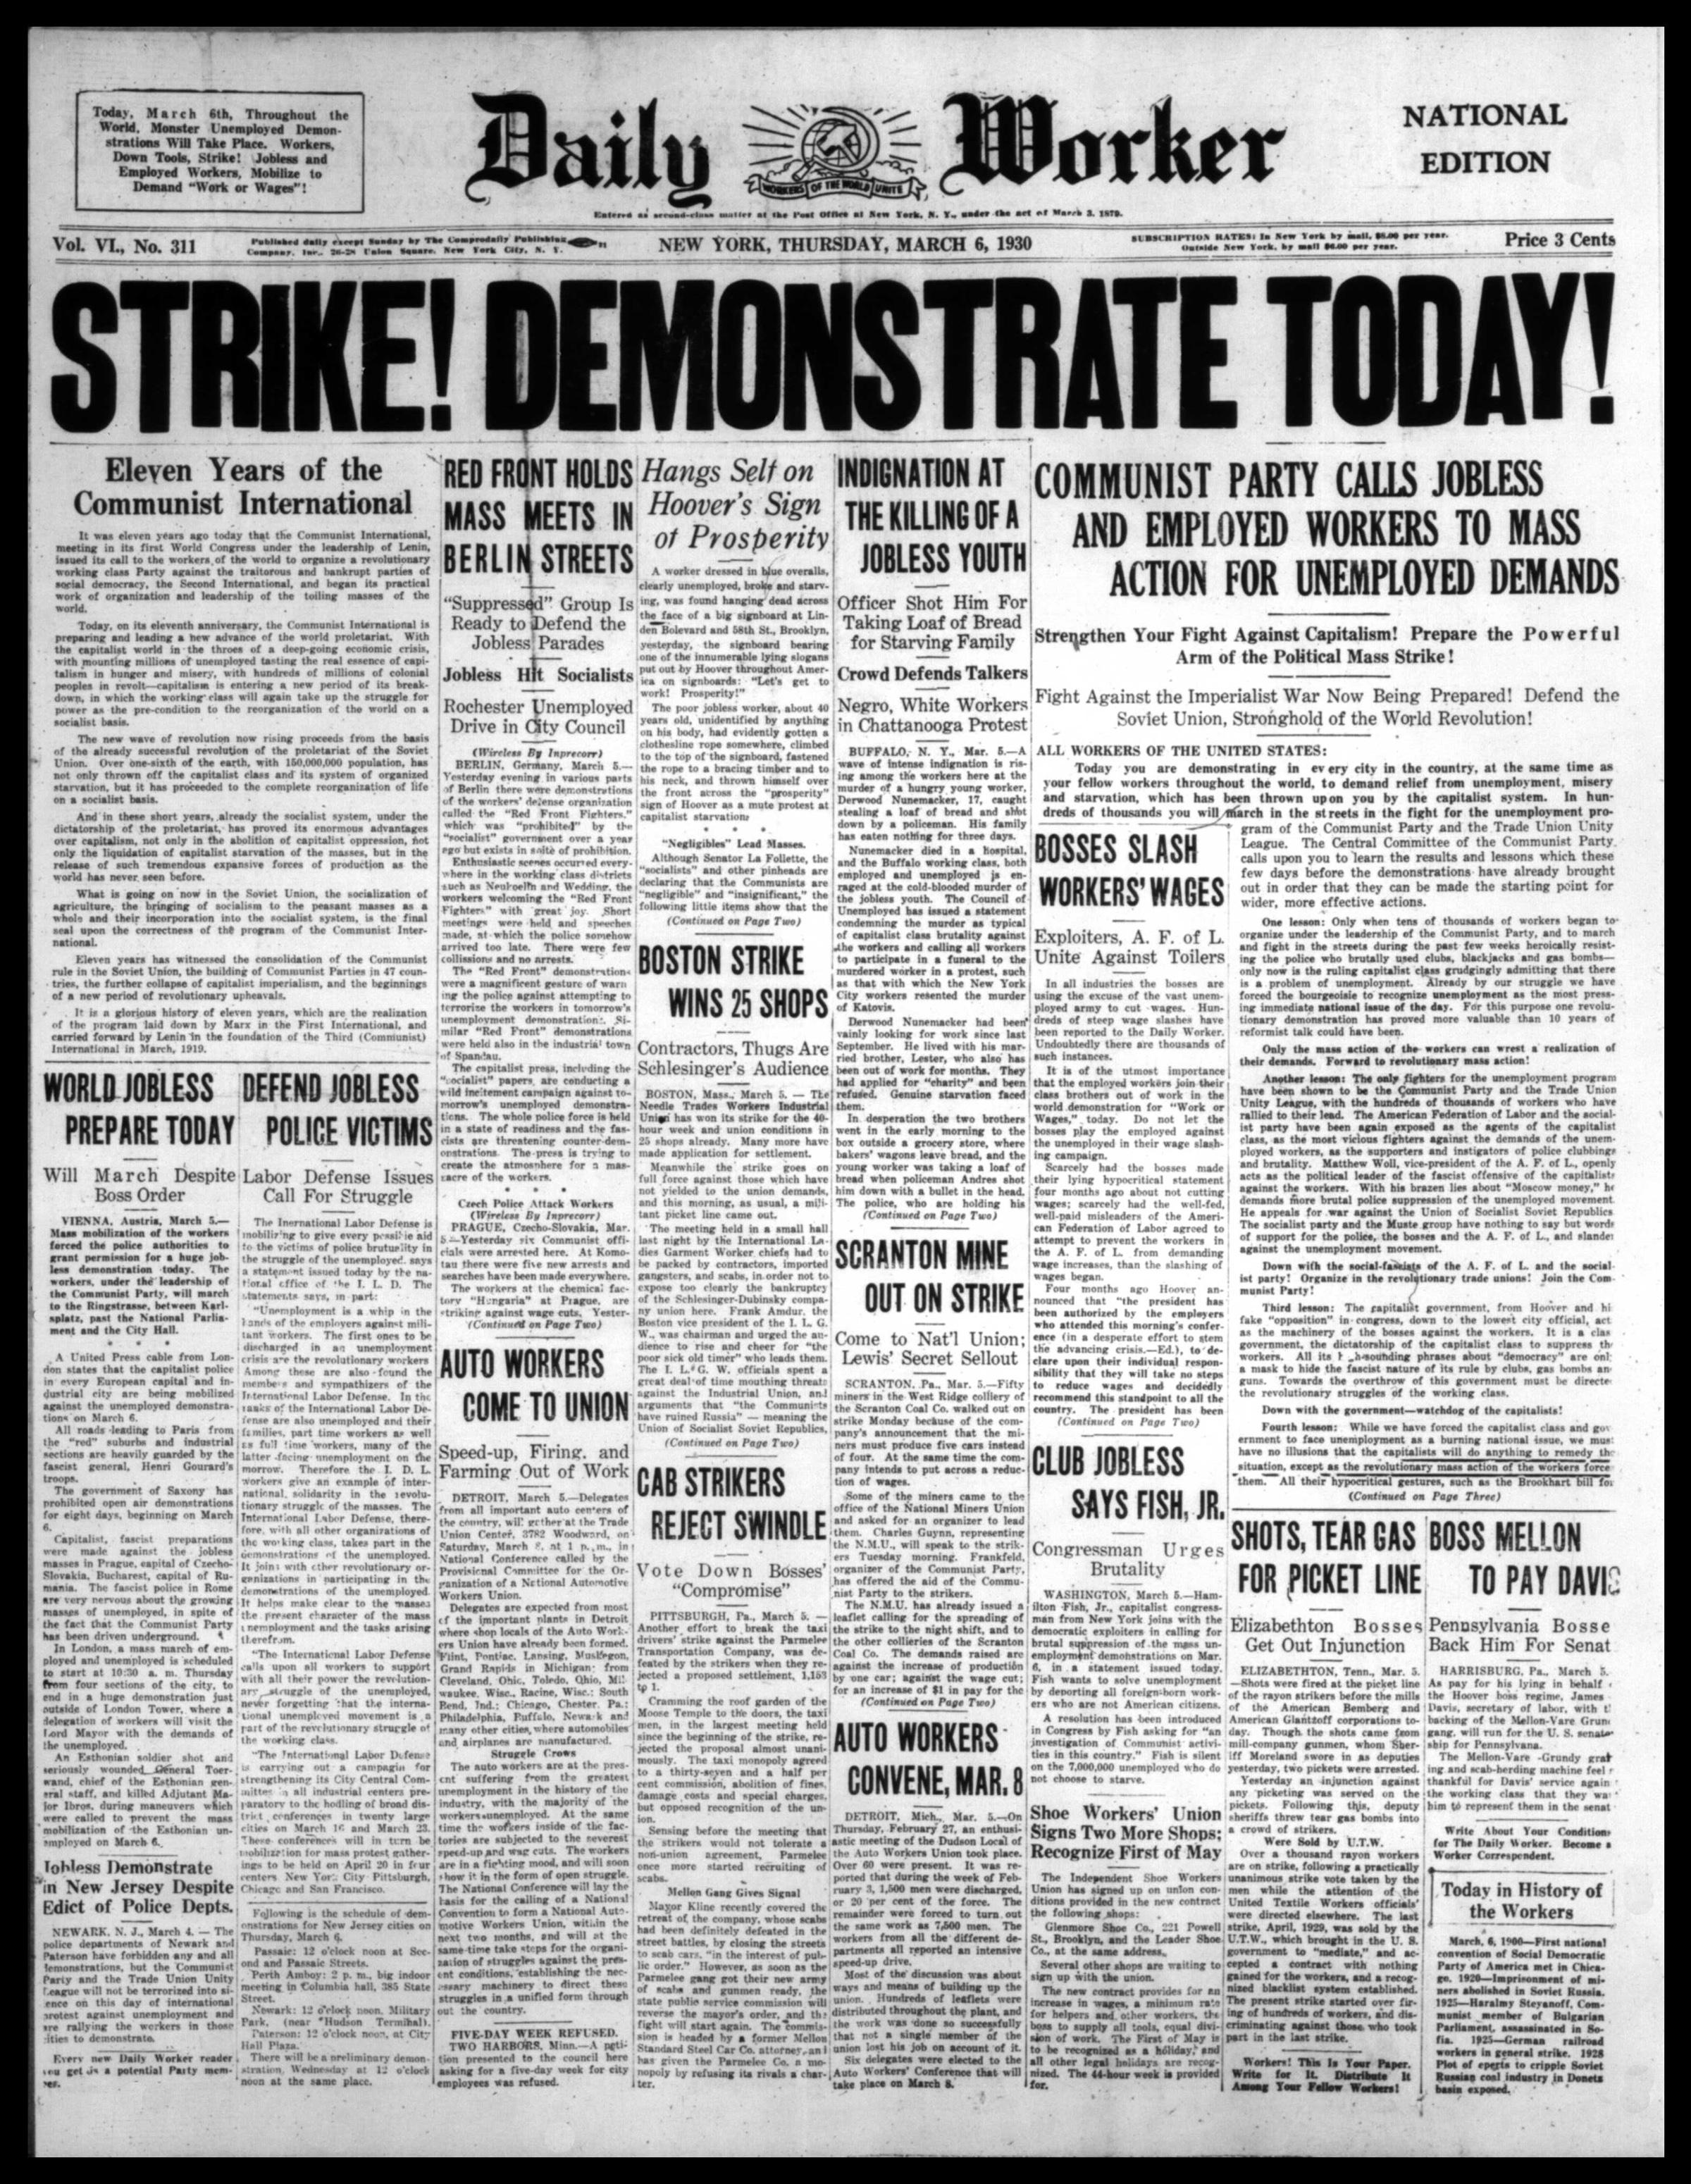 Daily Worker - Wikipedia